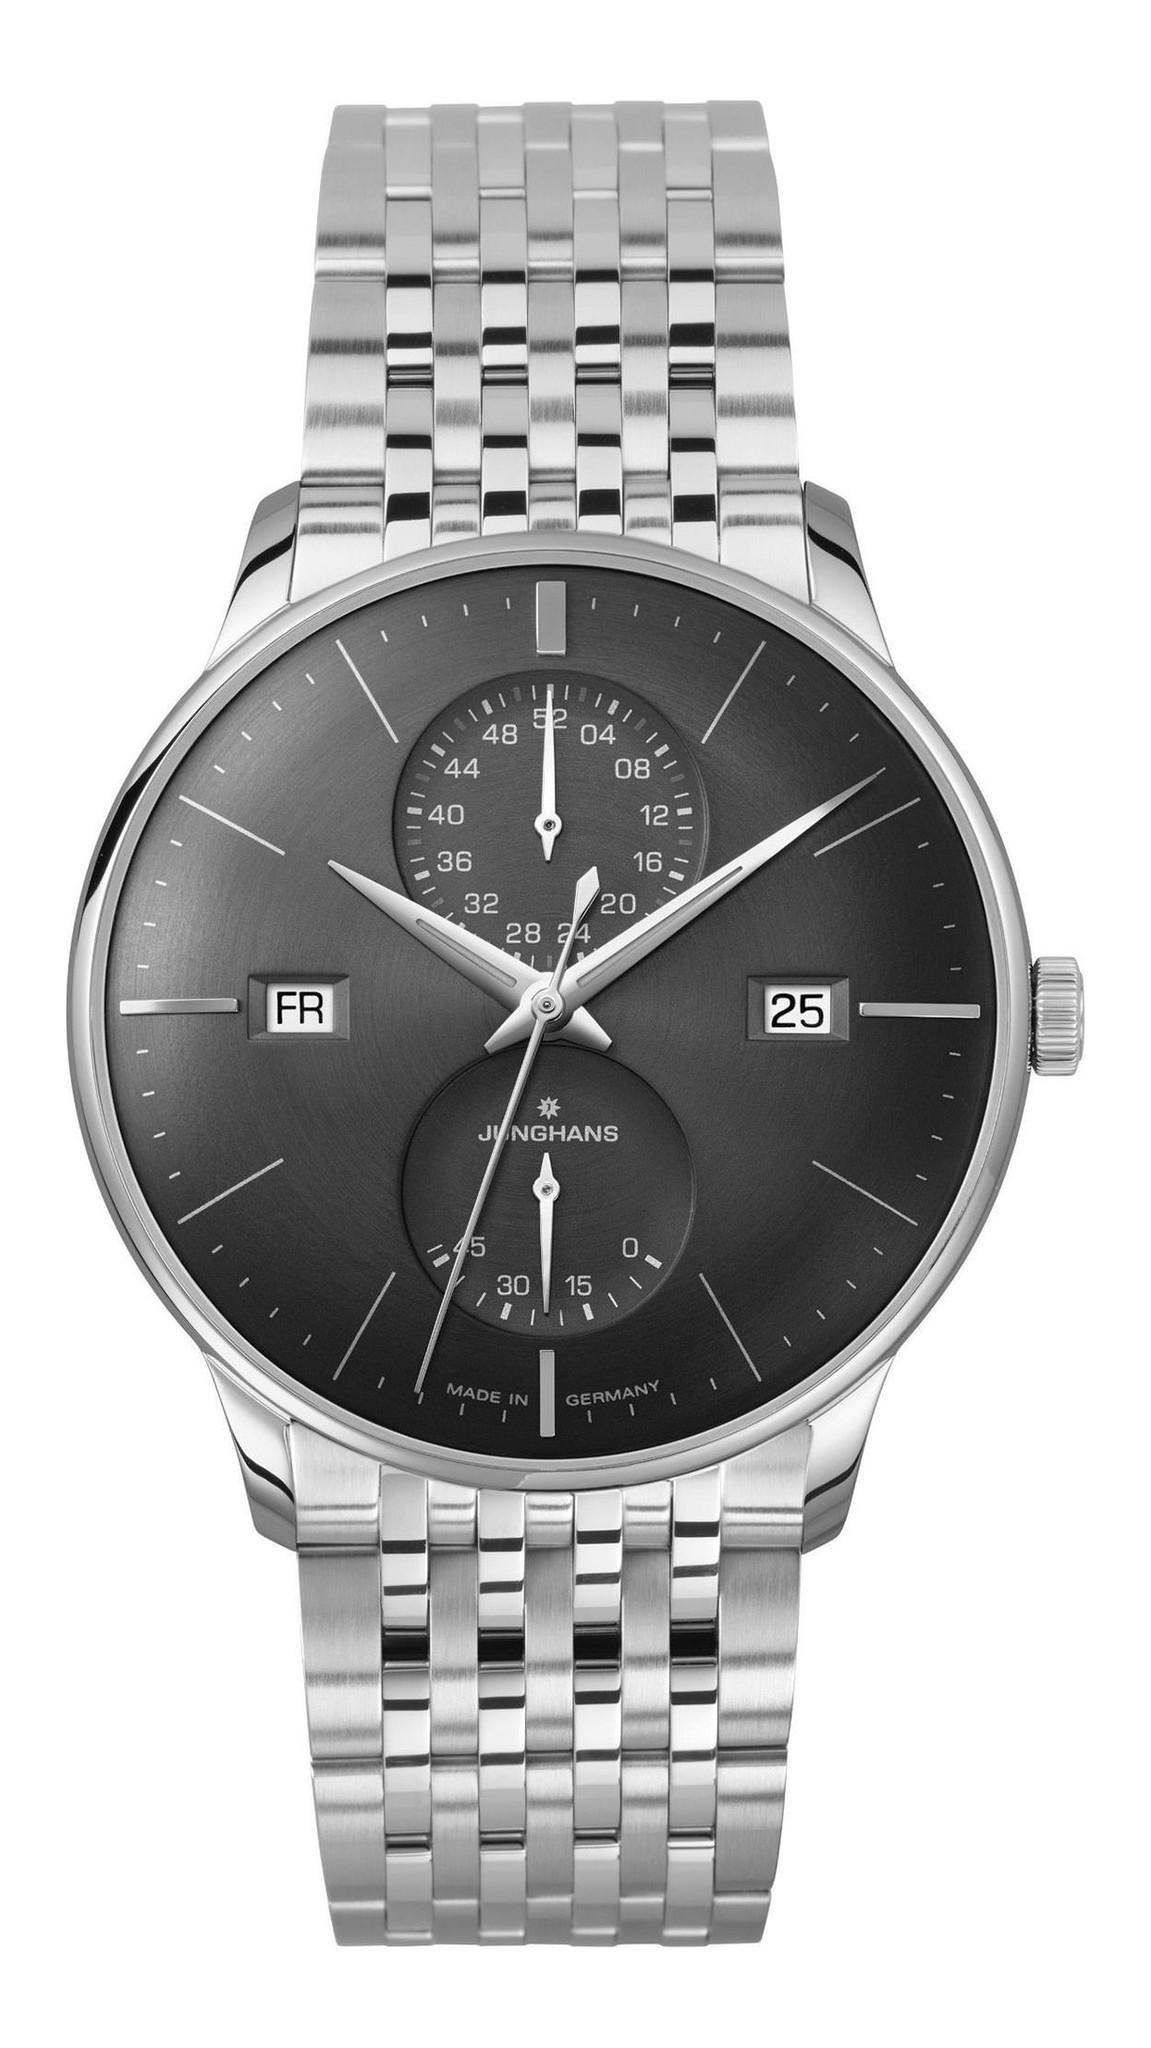 Junghans - Horloge Heren - Meister Agenda - 27456845-1